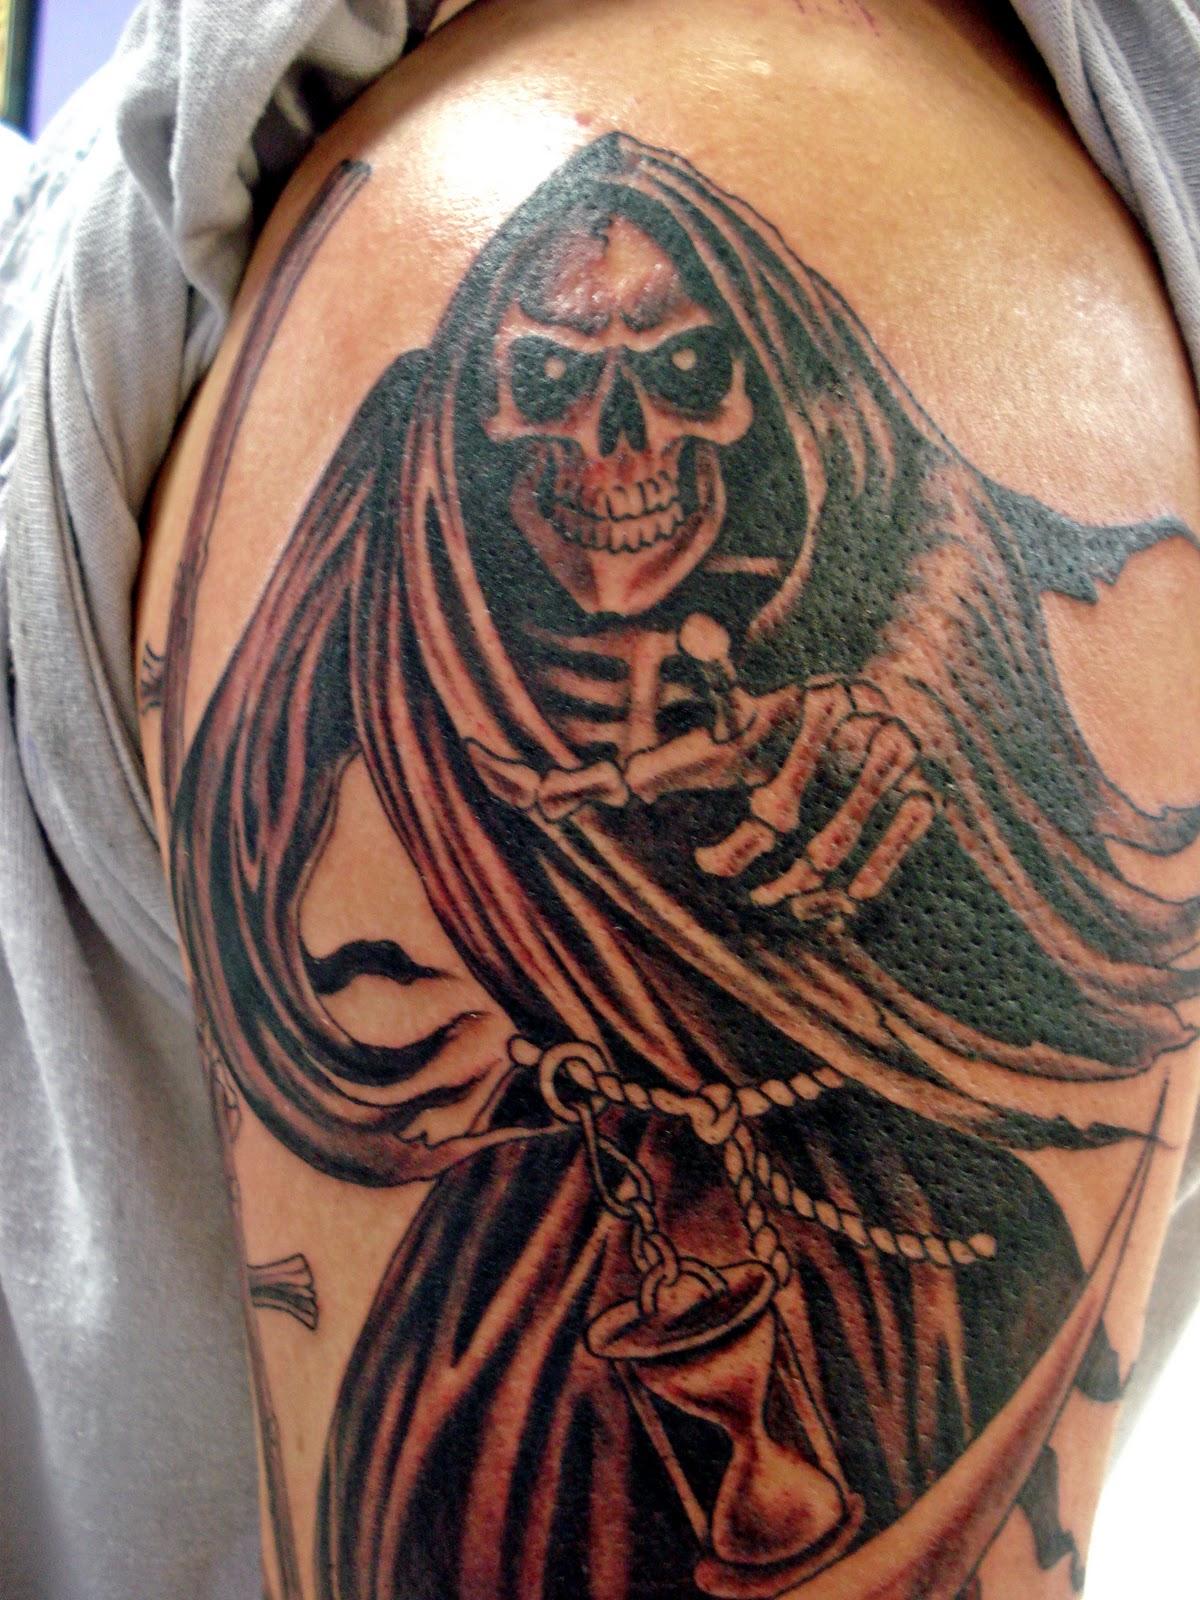 Grim Reaper Back Tattoo: Grim Reaper Tattoos